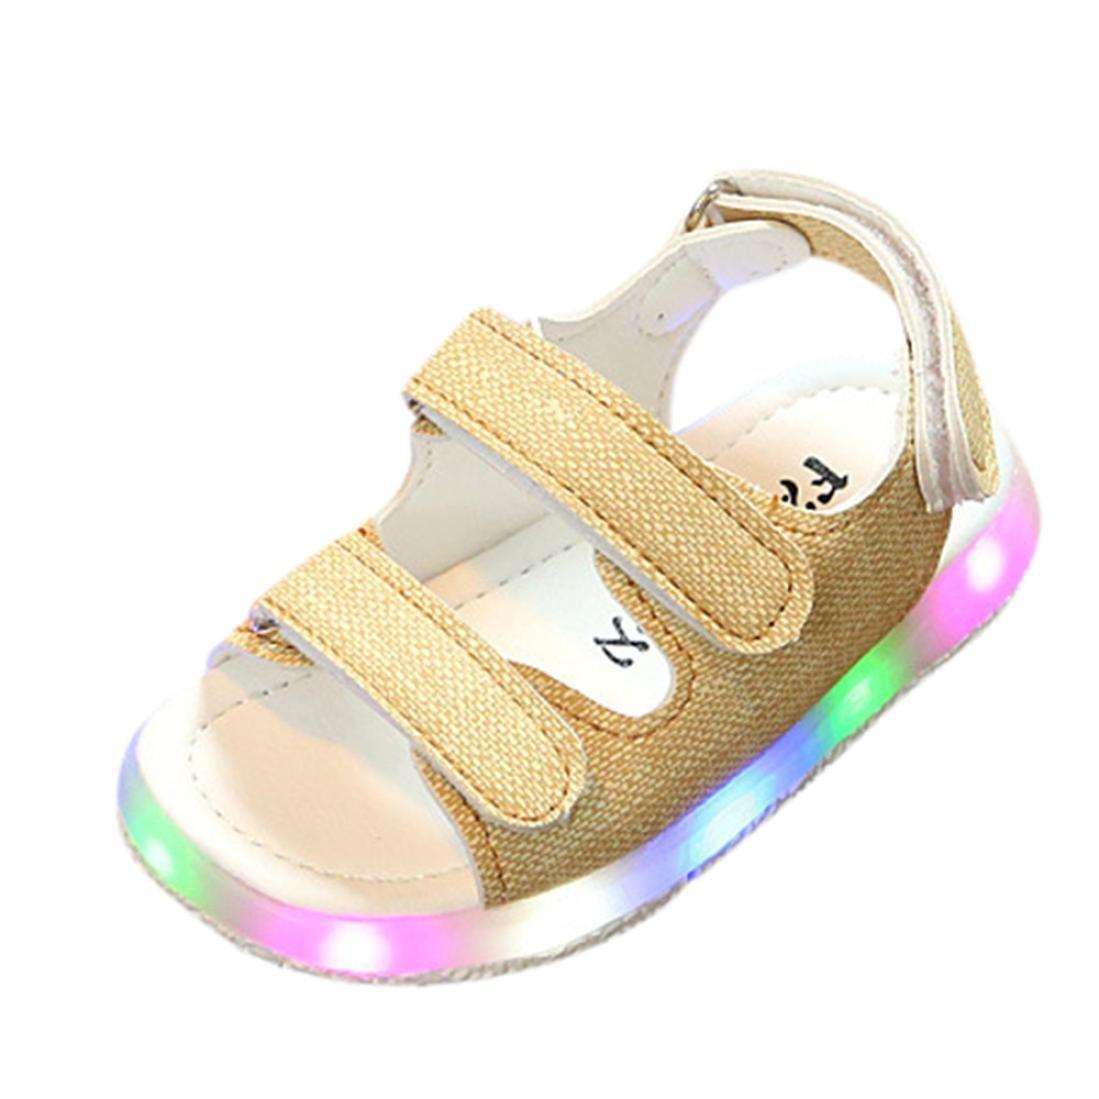 Bebé NiñA Zapatos Sandalias Dress_Start ®Sandalias Romanas para Bebé NiñA Verano Zapatillas Suaves Sandalias Playa Zapatos Princesa Zapatos De Bautizo CumpleañOs Fiesta